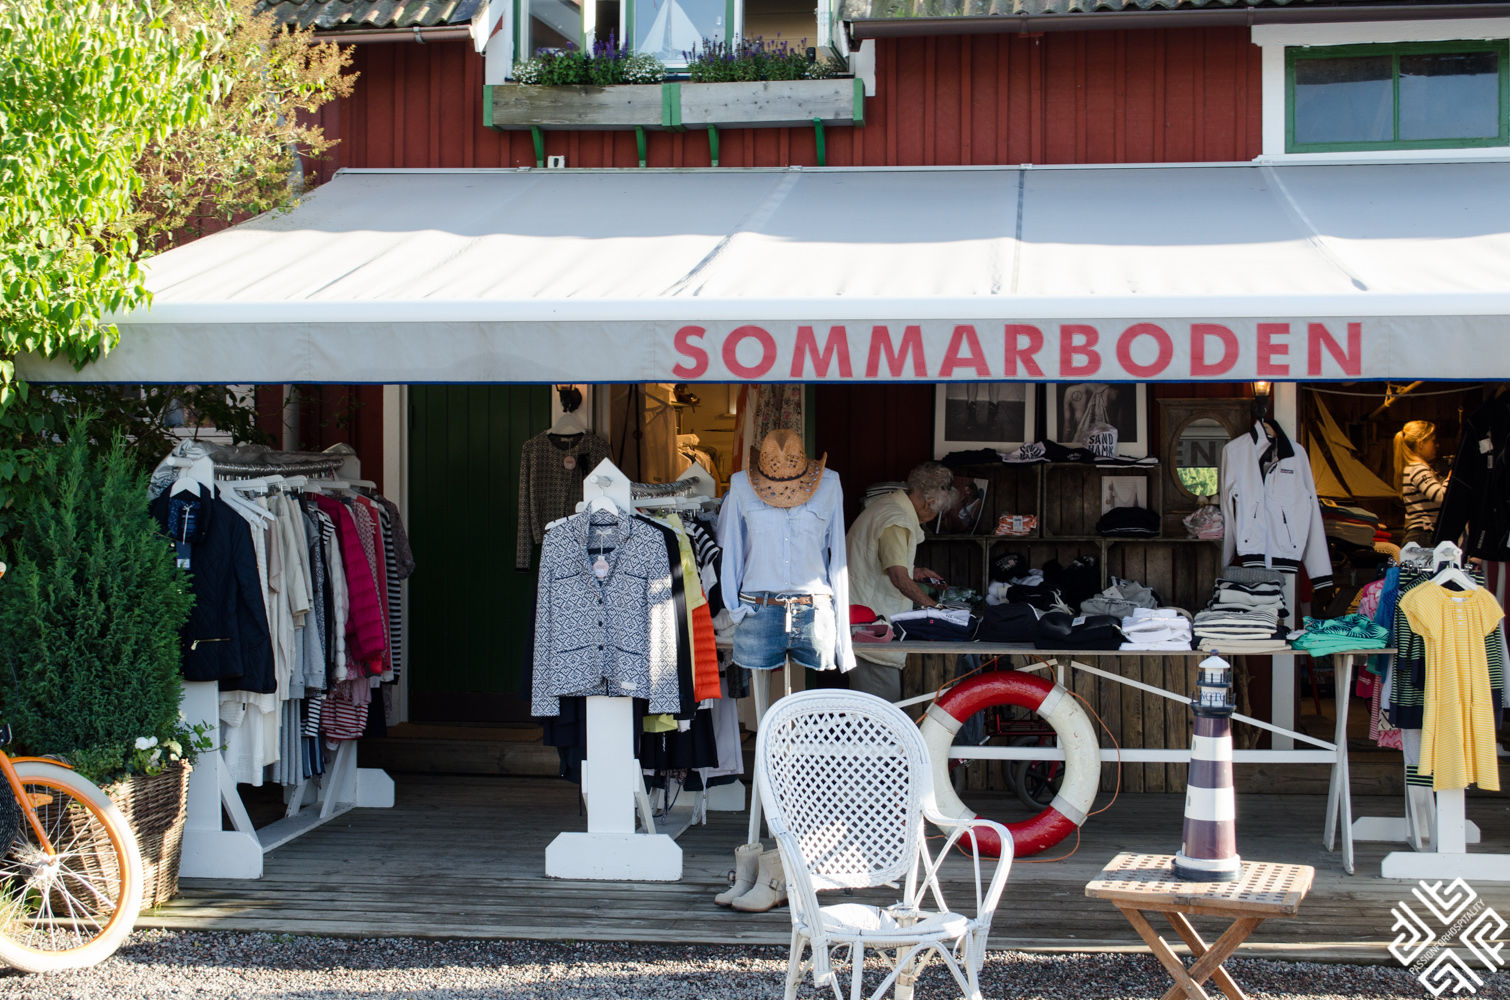 stockholm_archipelago_sandhamn-21